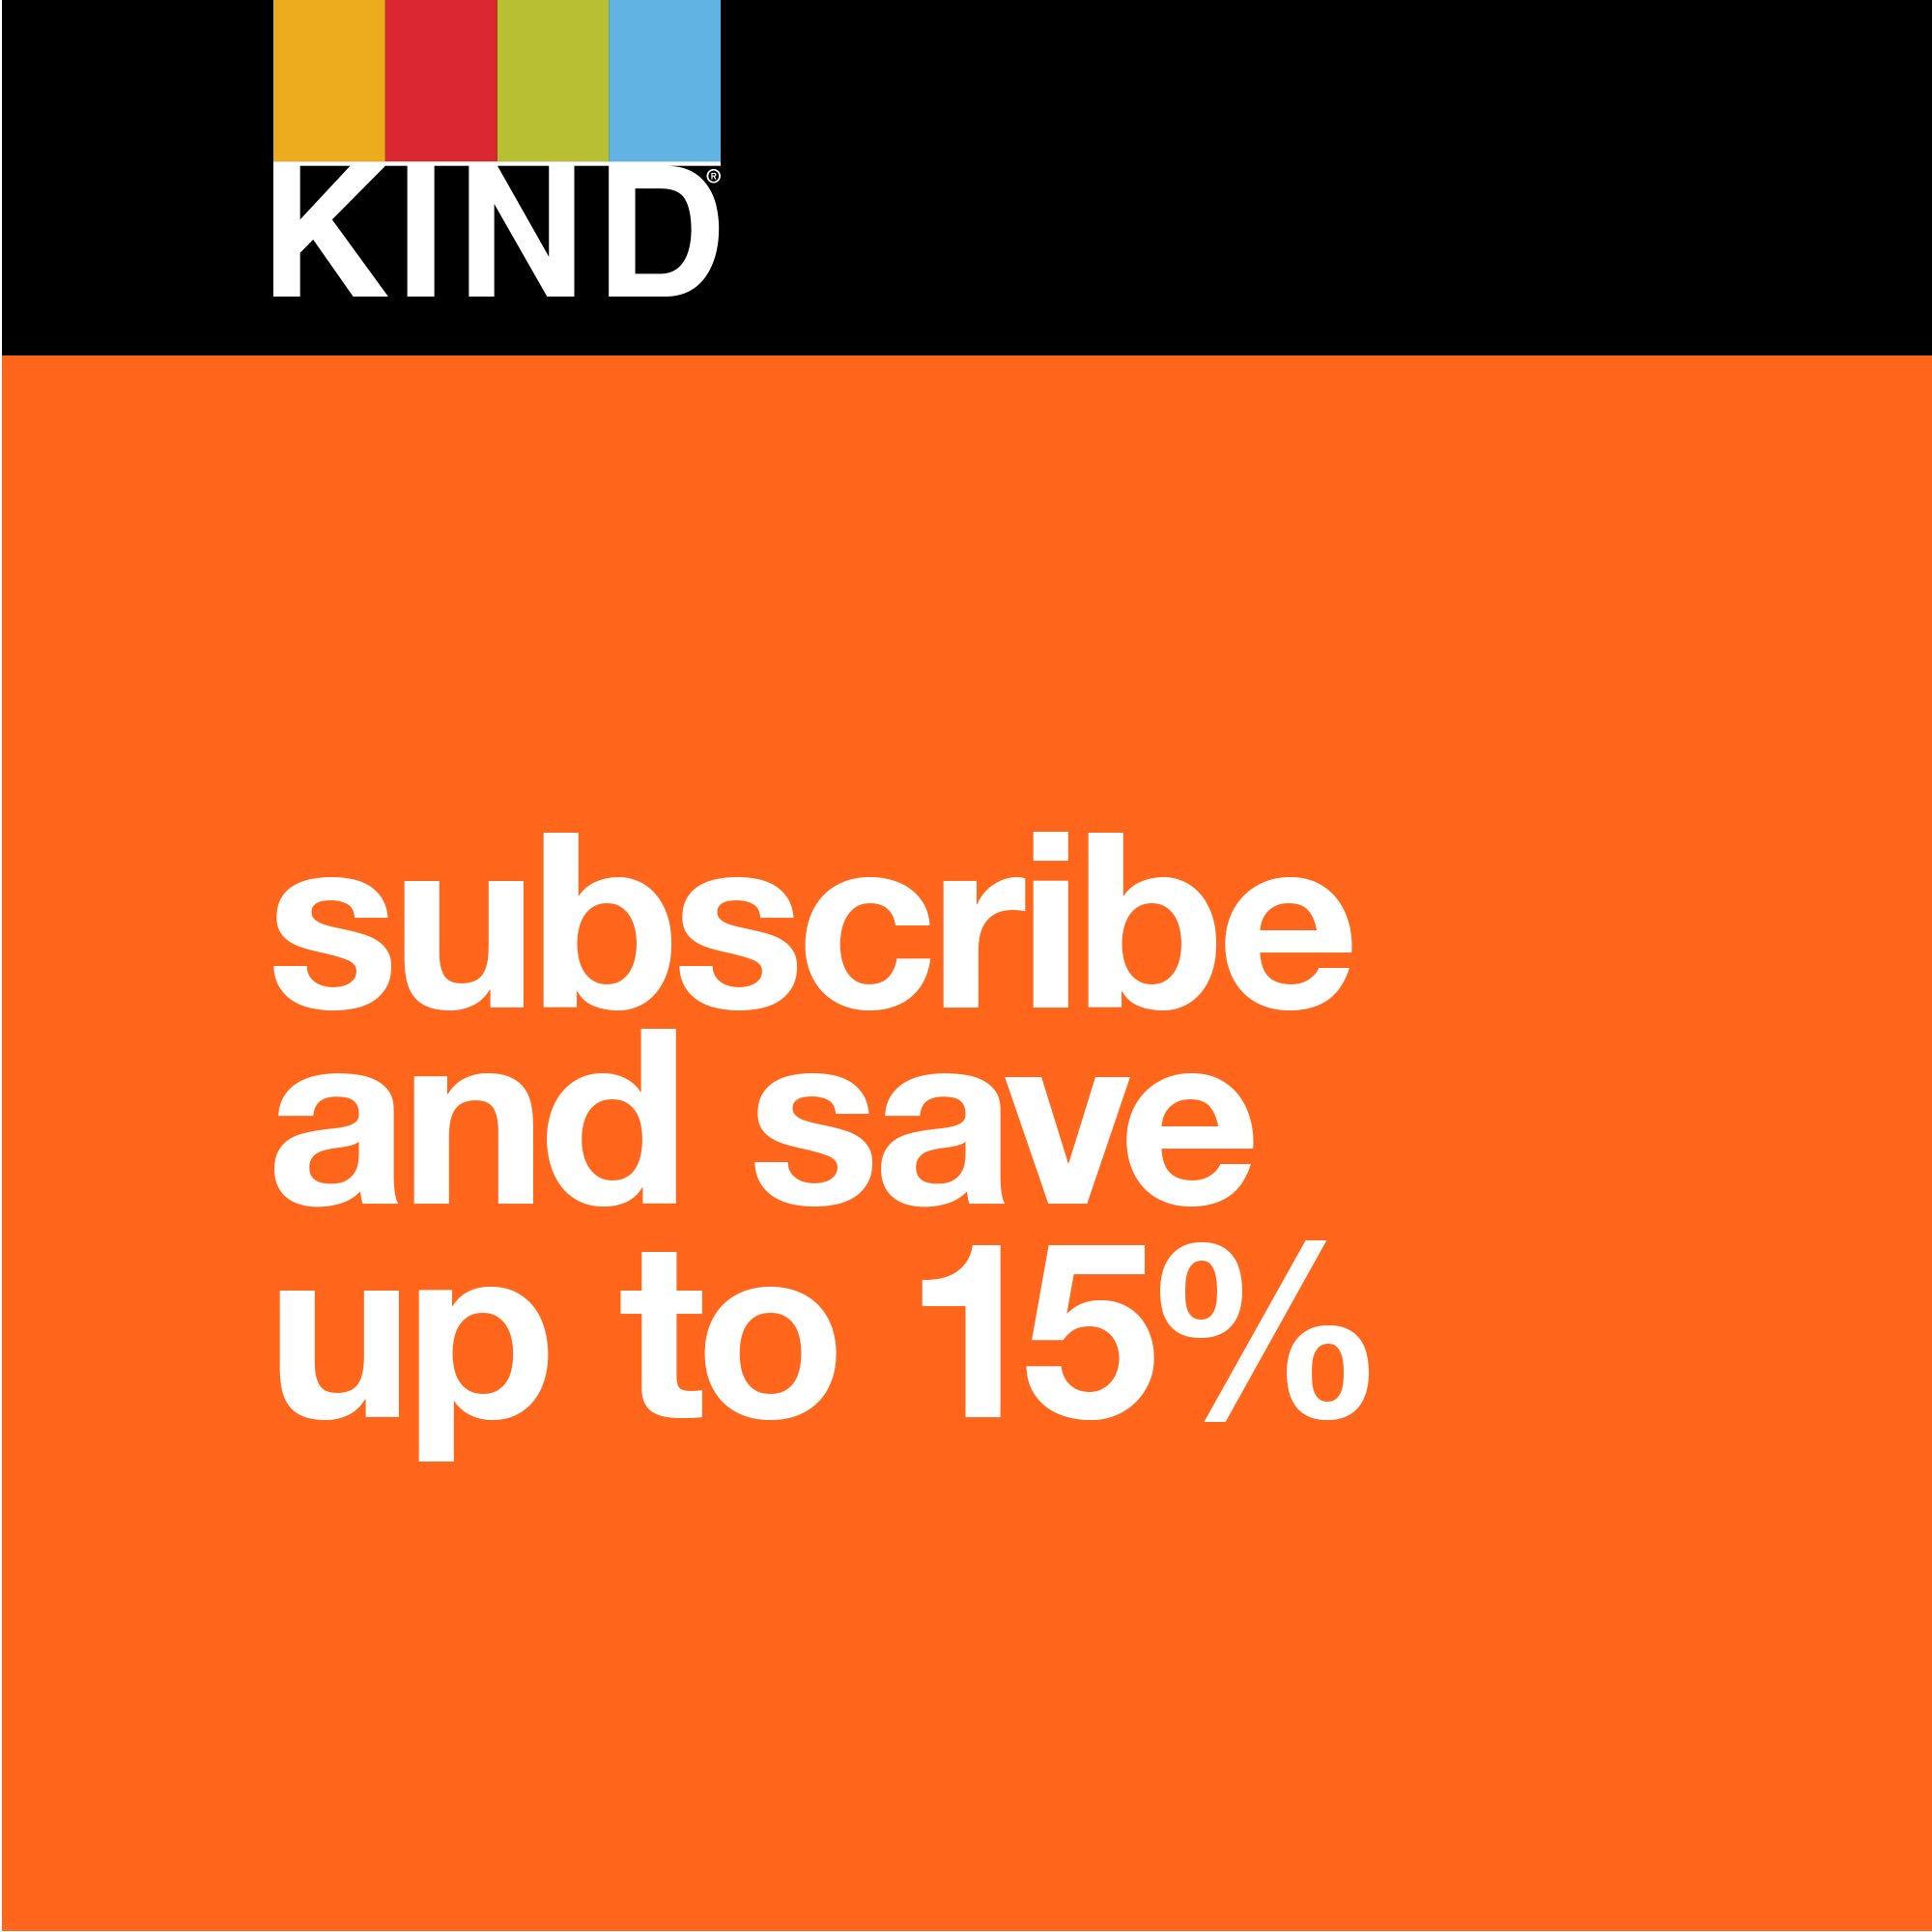 KIND Healthy Grains Granola Bars, Peanut Butter Dark Chocolate, Gluten Free, 1.2 oz, 30 Count by KIND (Image #7)